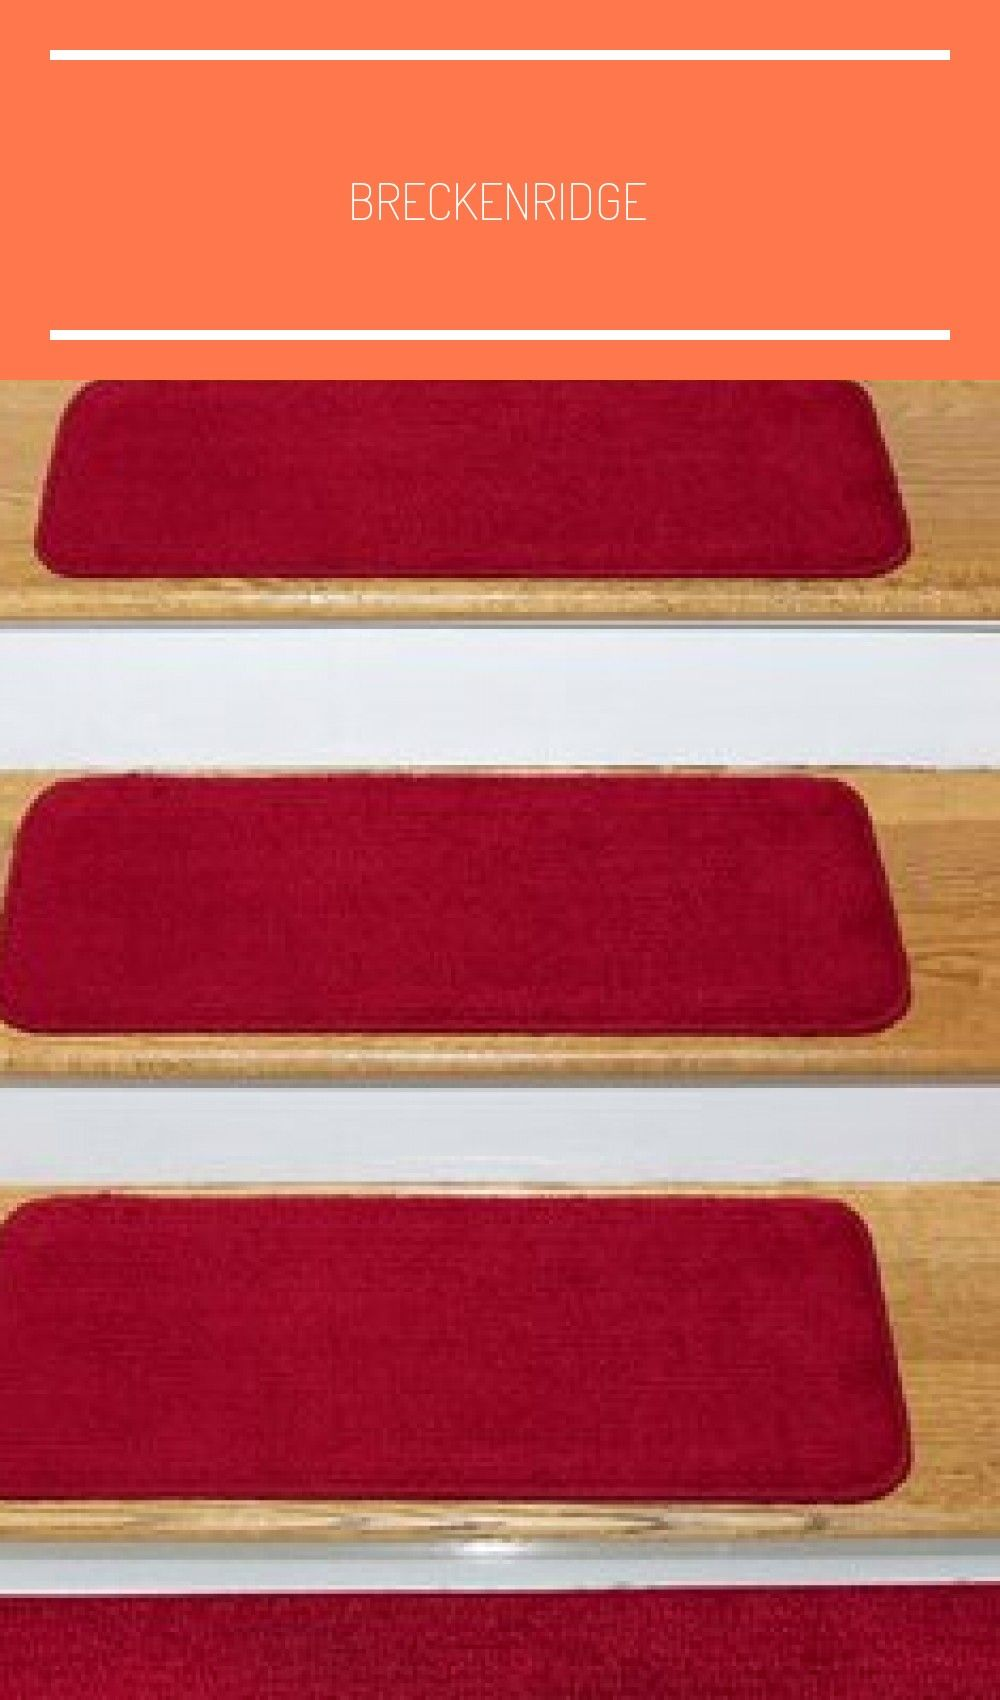 Best Breckenridge In 2020 Carpet Stairs Sh*G Carpet Carpet 400 x 300